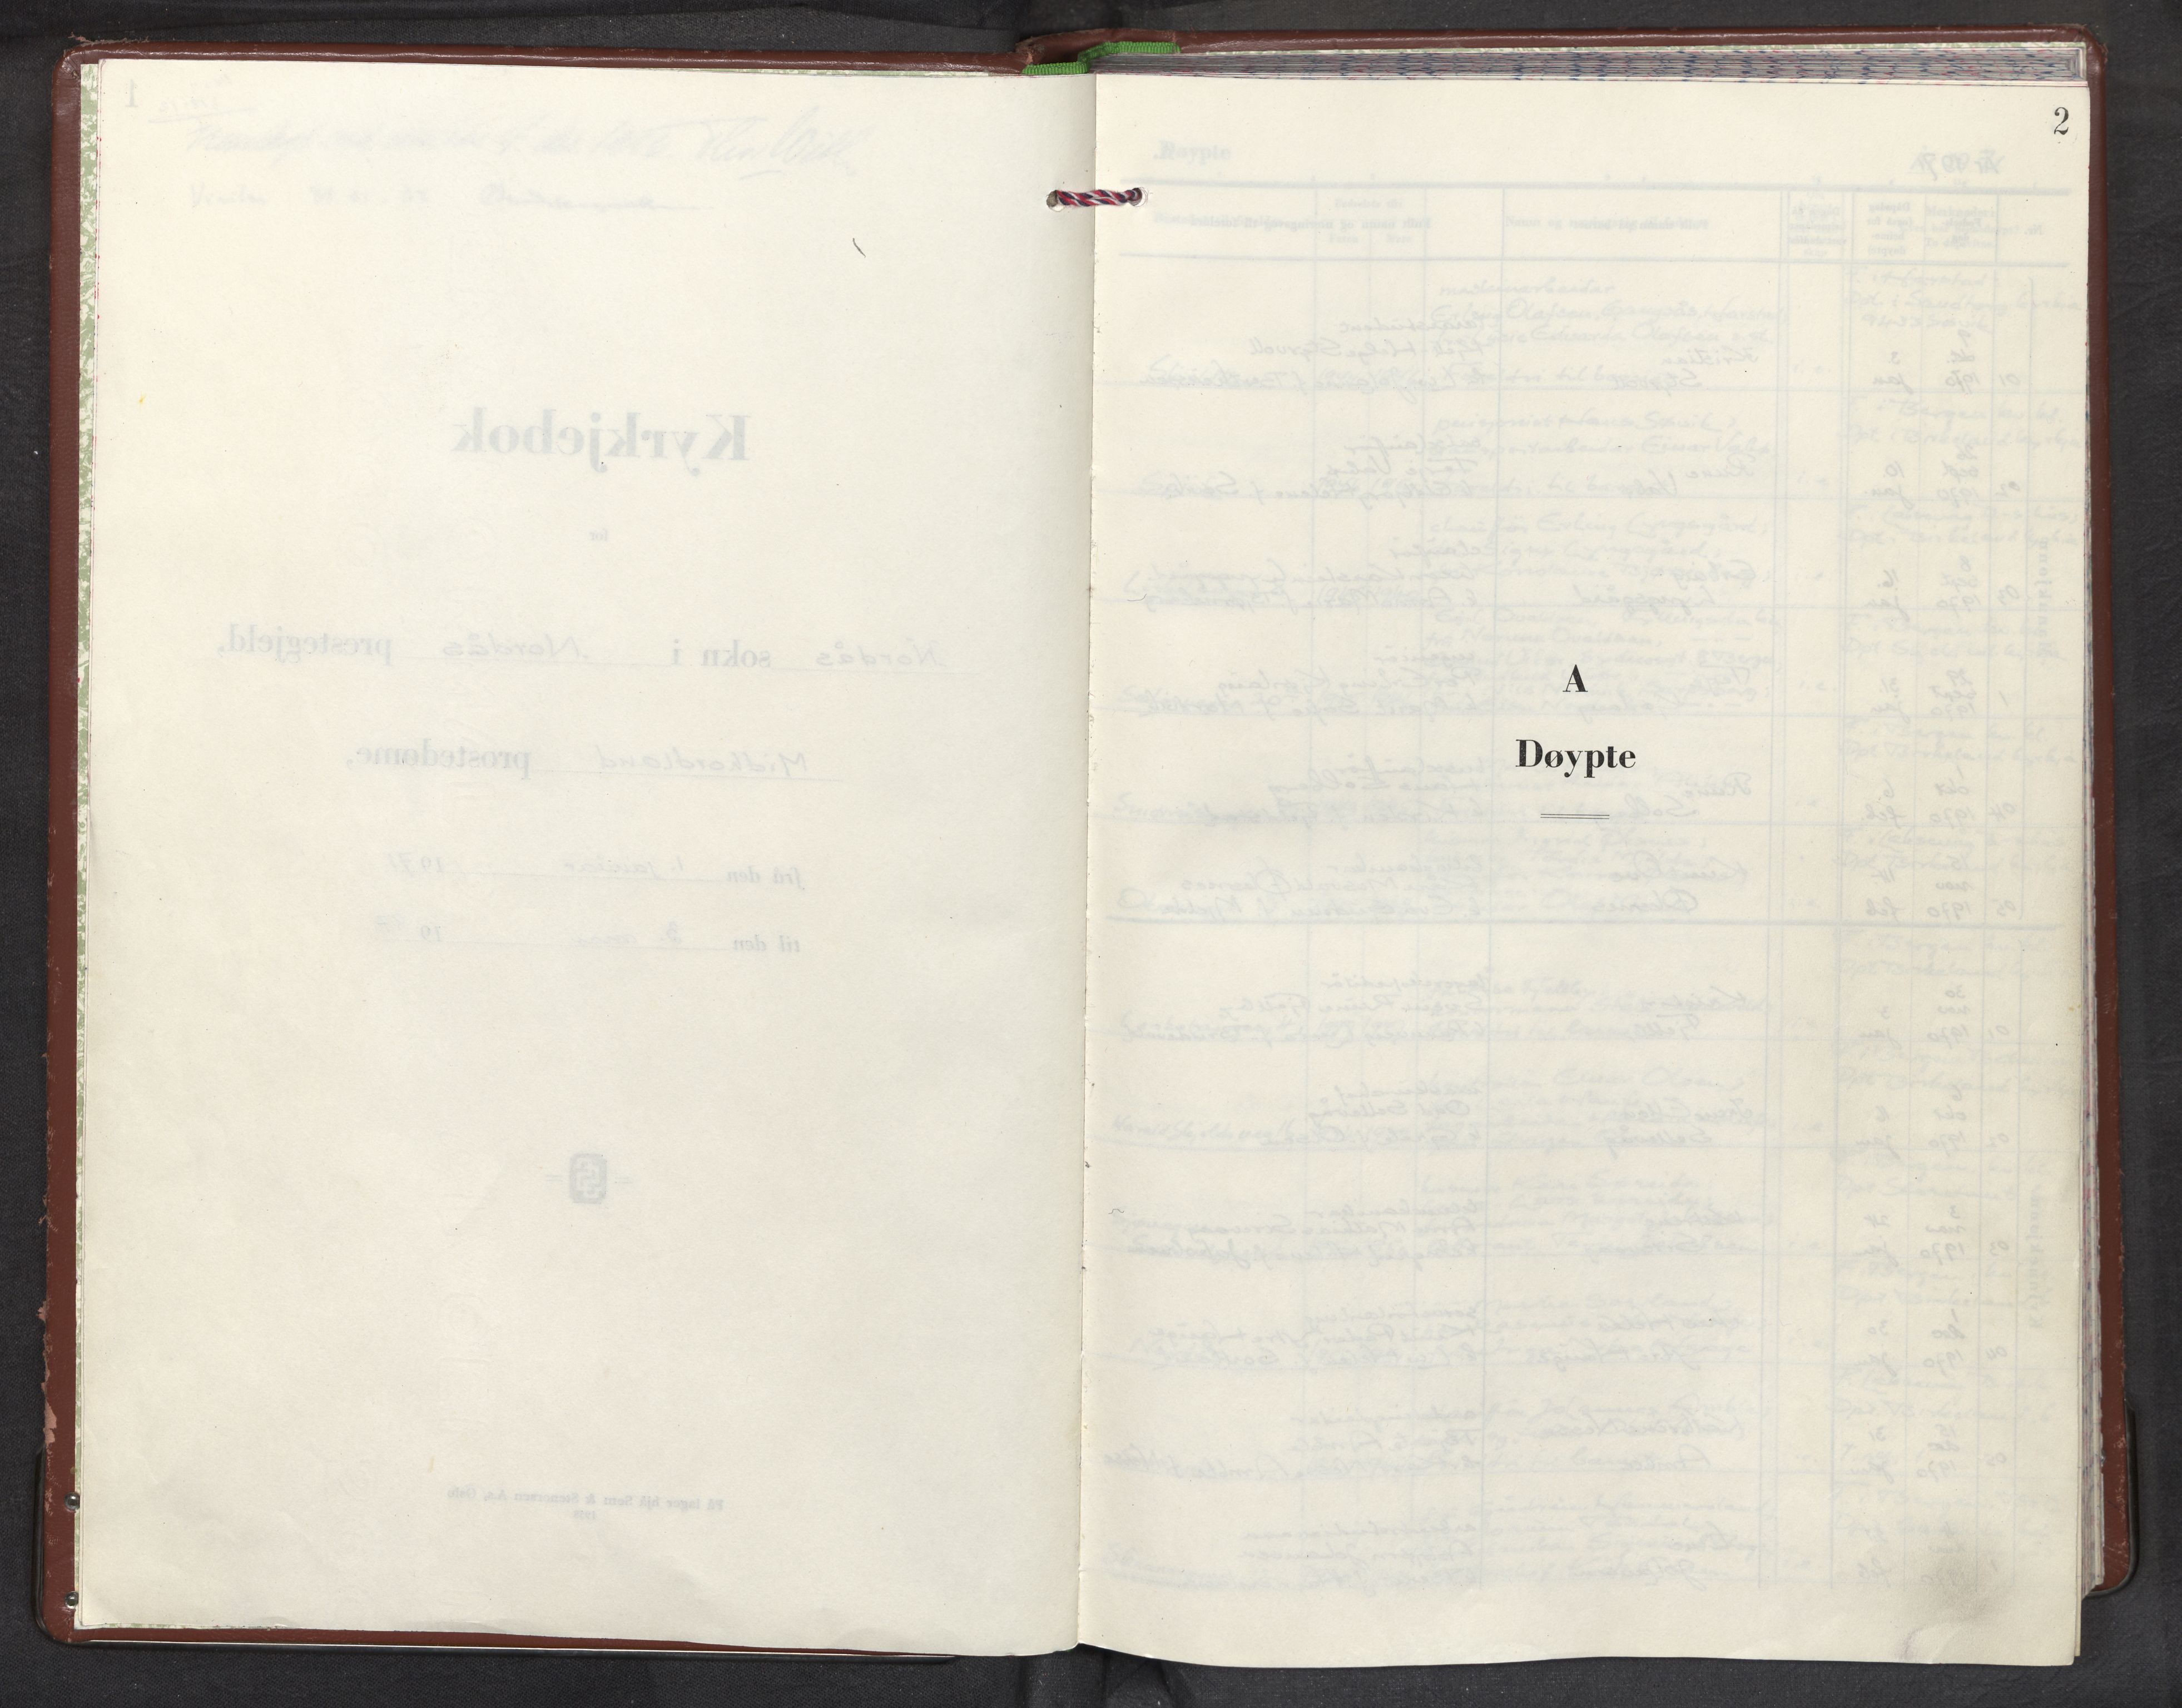 SAB, Nordås sokneprestembete, Parish register (official) no. A 1, 1971-1987, p. 2